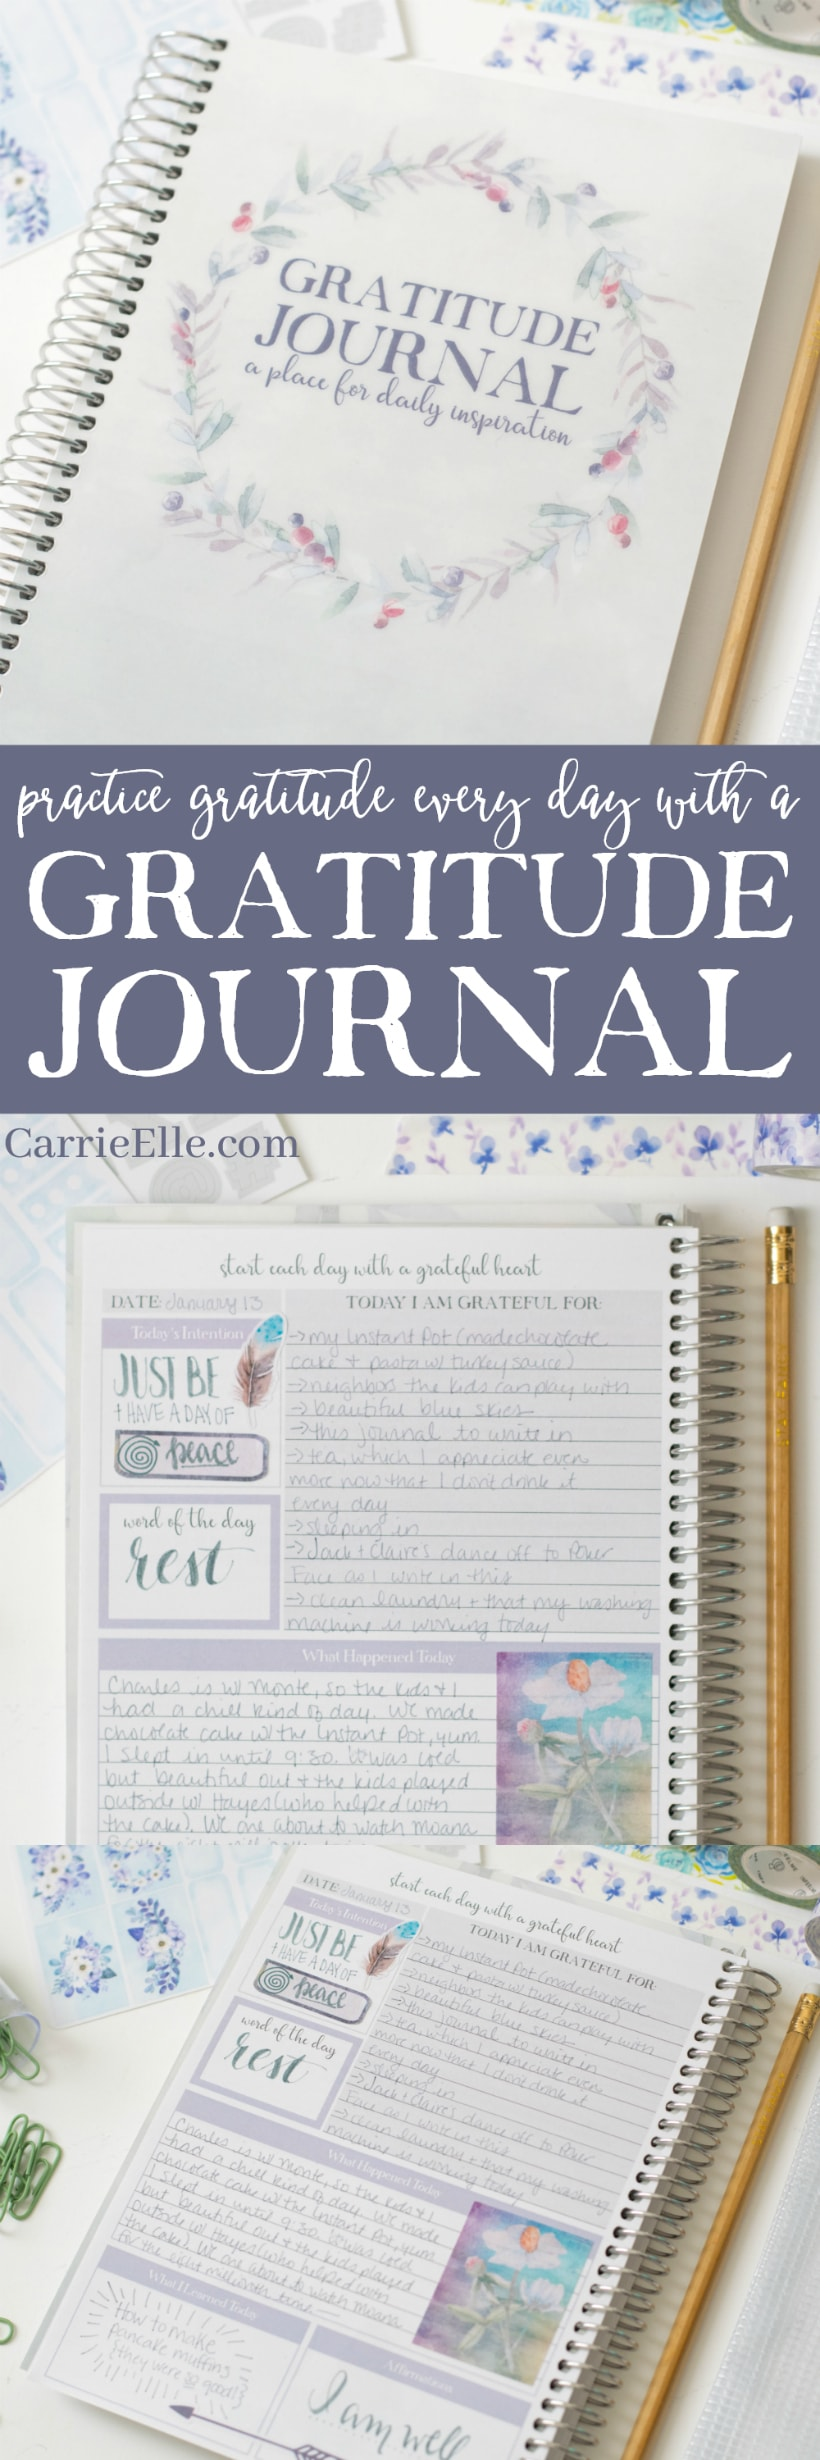 Beautiful Gratitude Journal